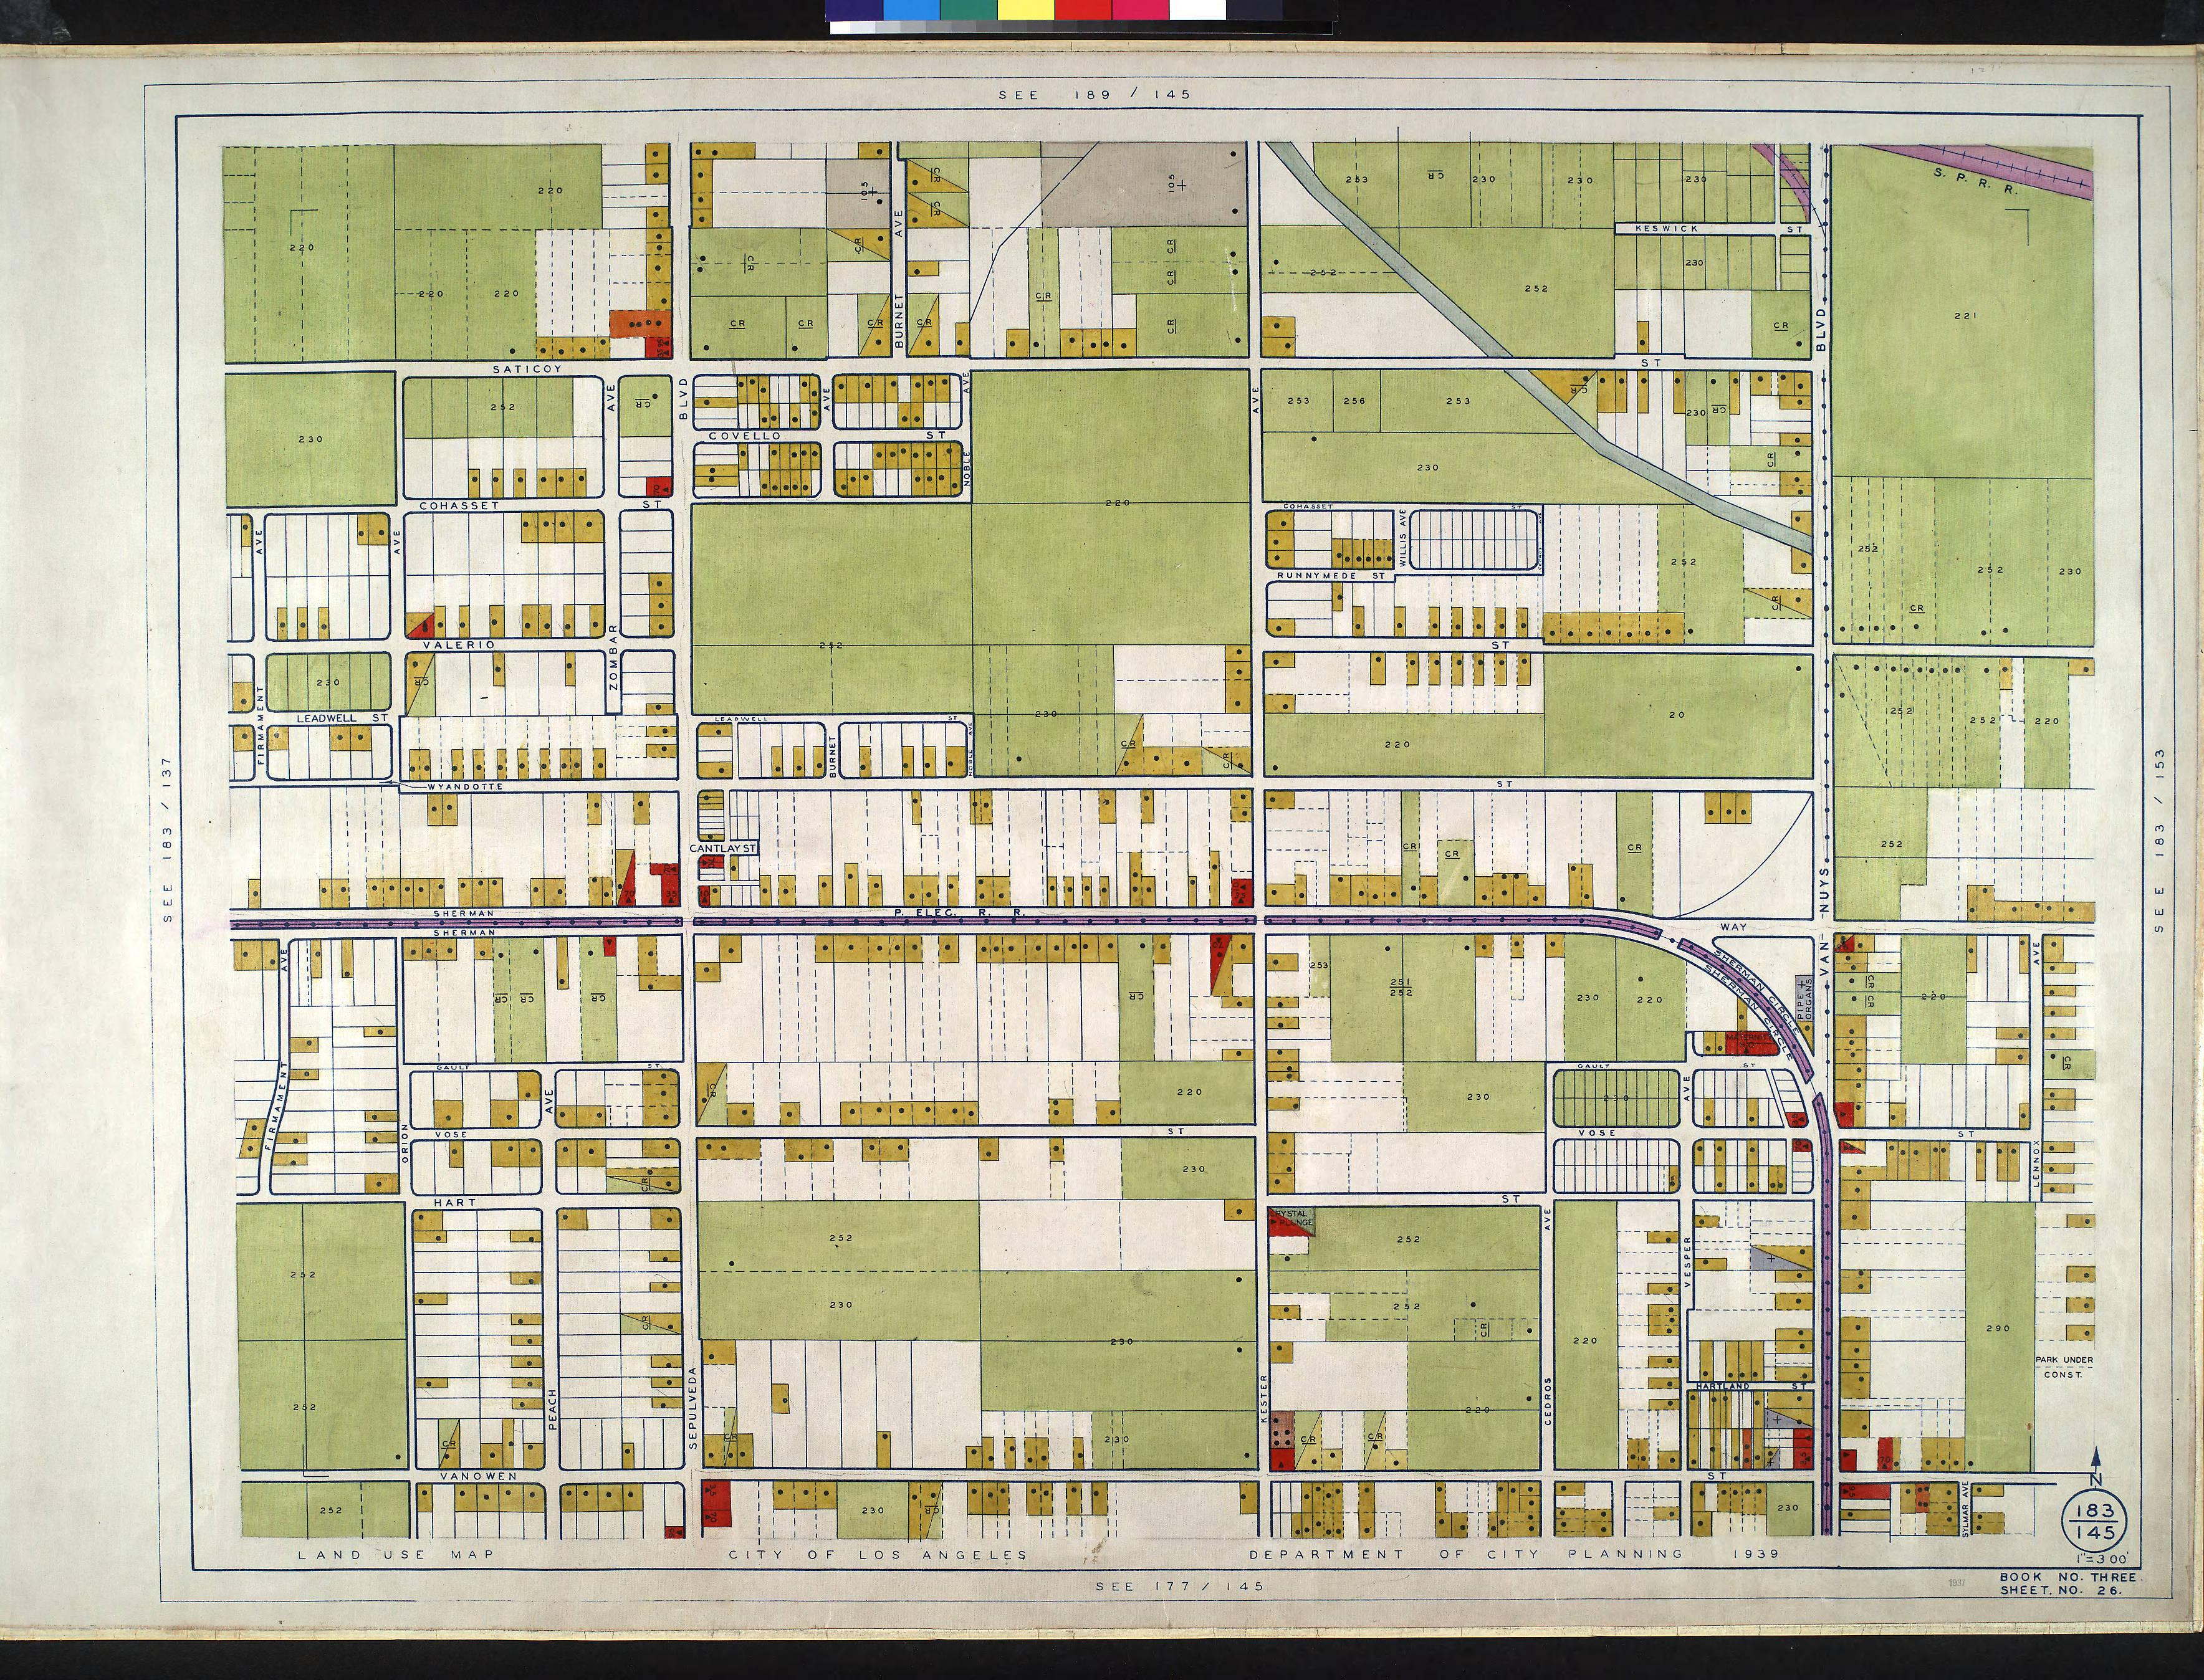 Galpin Jaguar Service Van Nuys Los Angeles Jaguar Service Map Of - Los angeles map districts